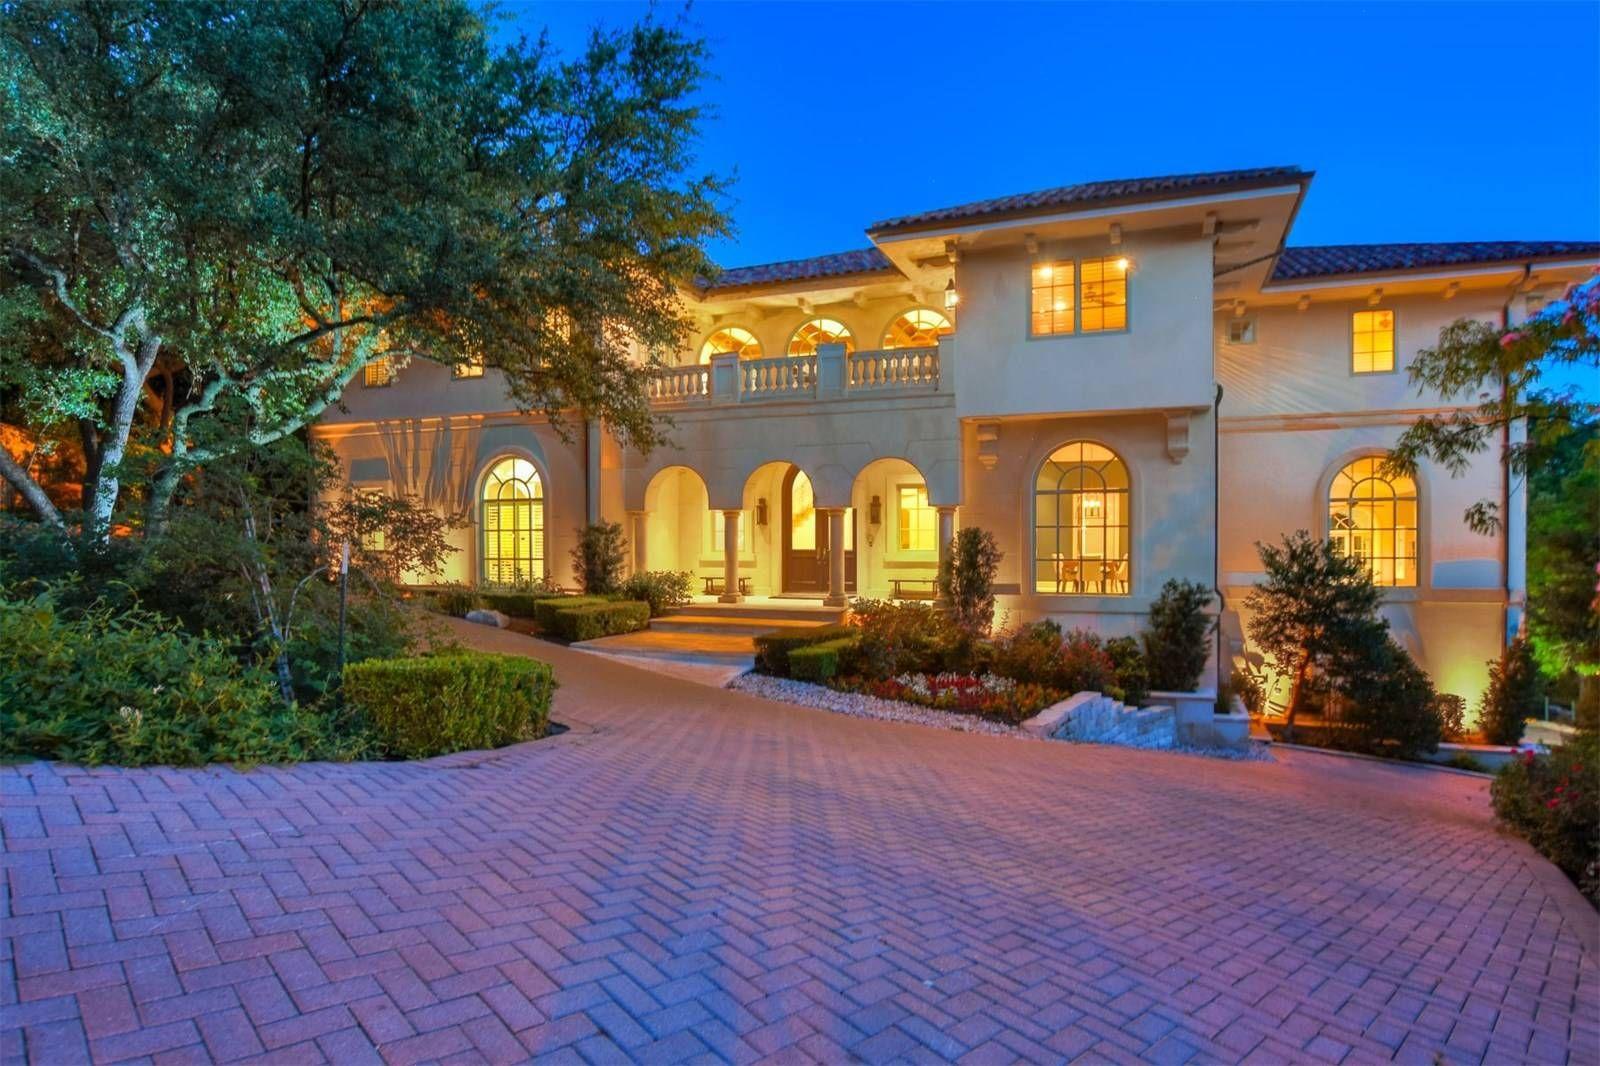 4303 island avenue austin texas united states luxury